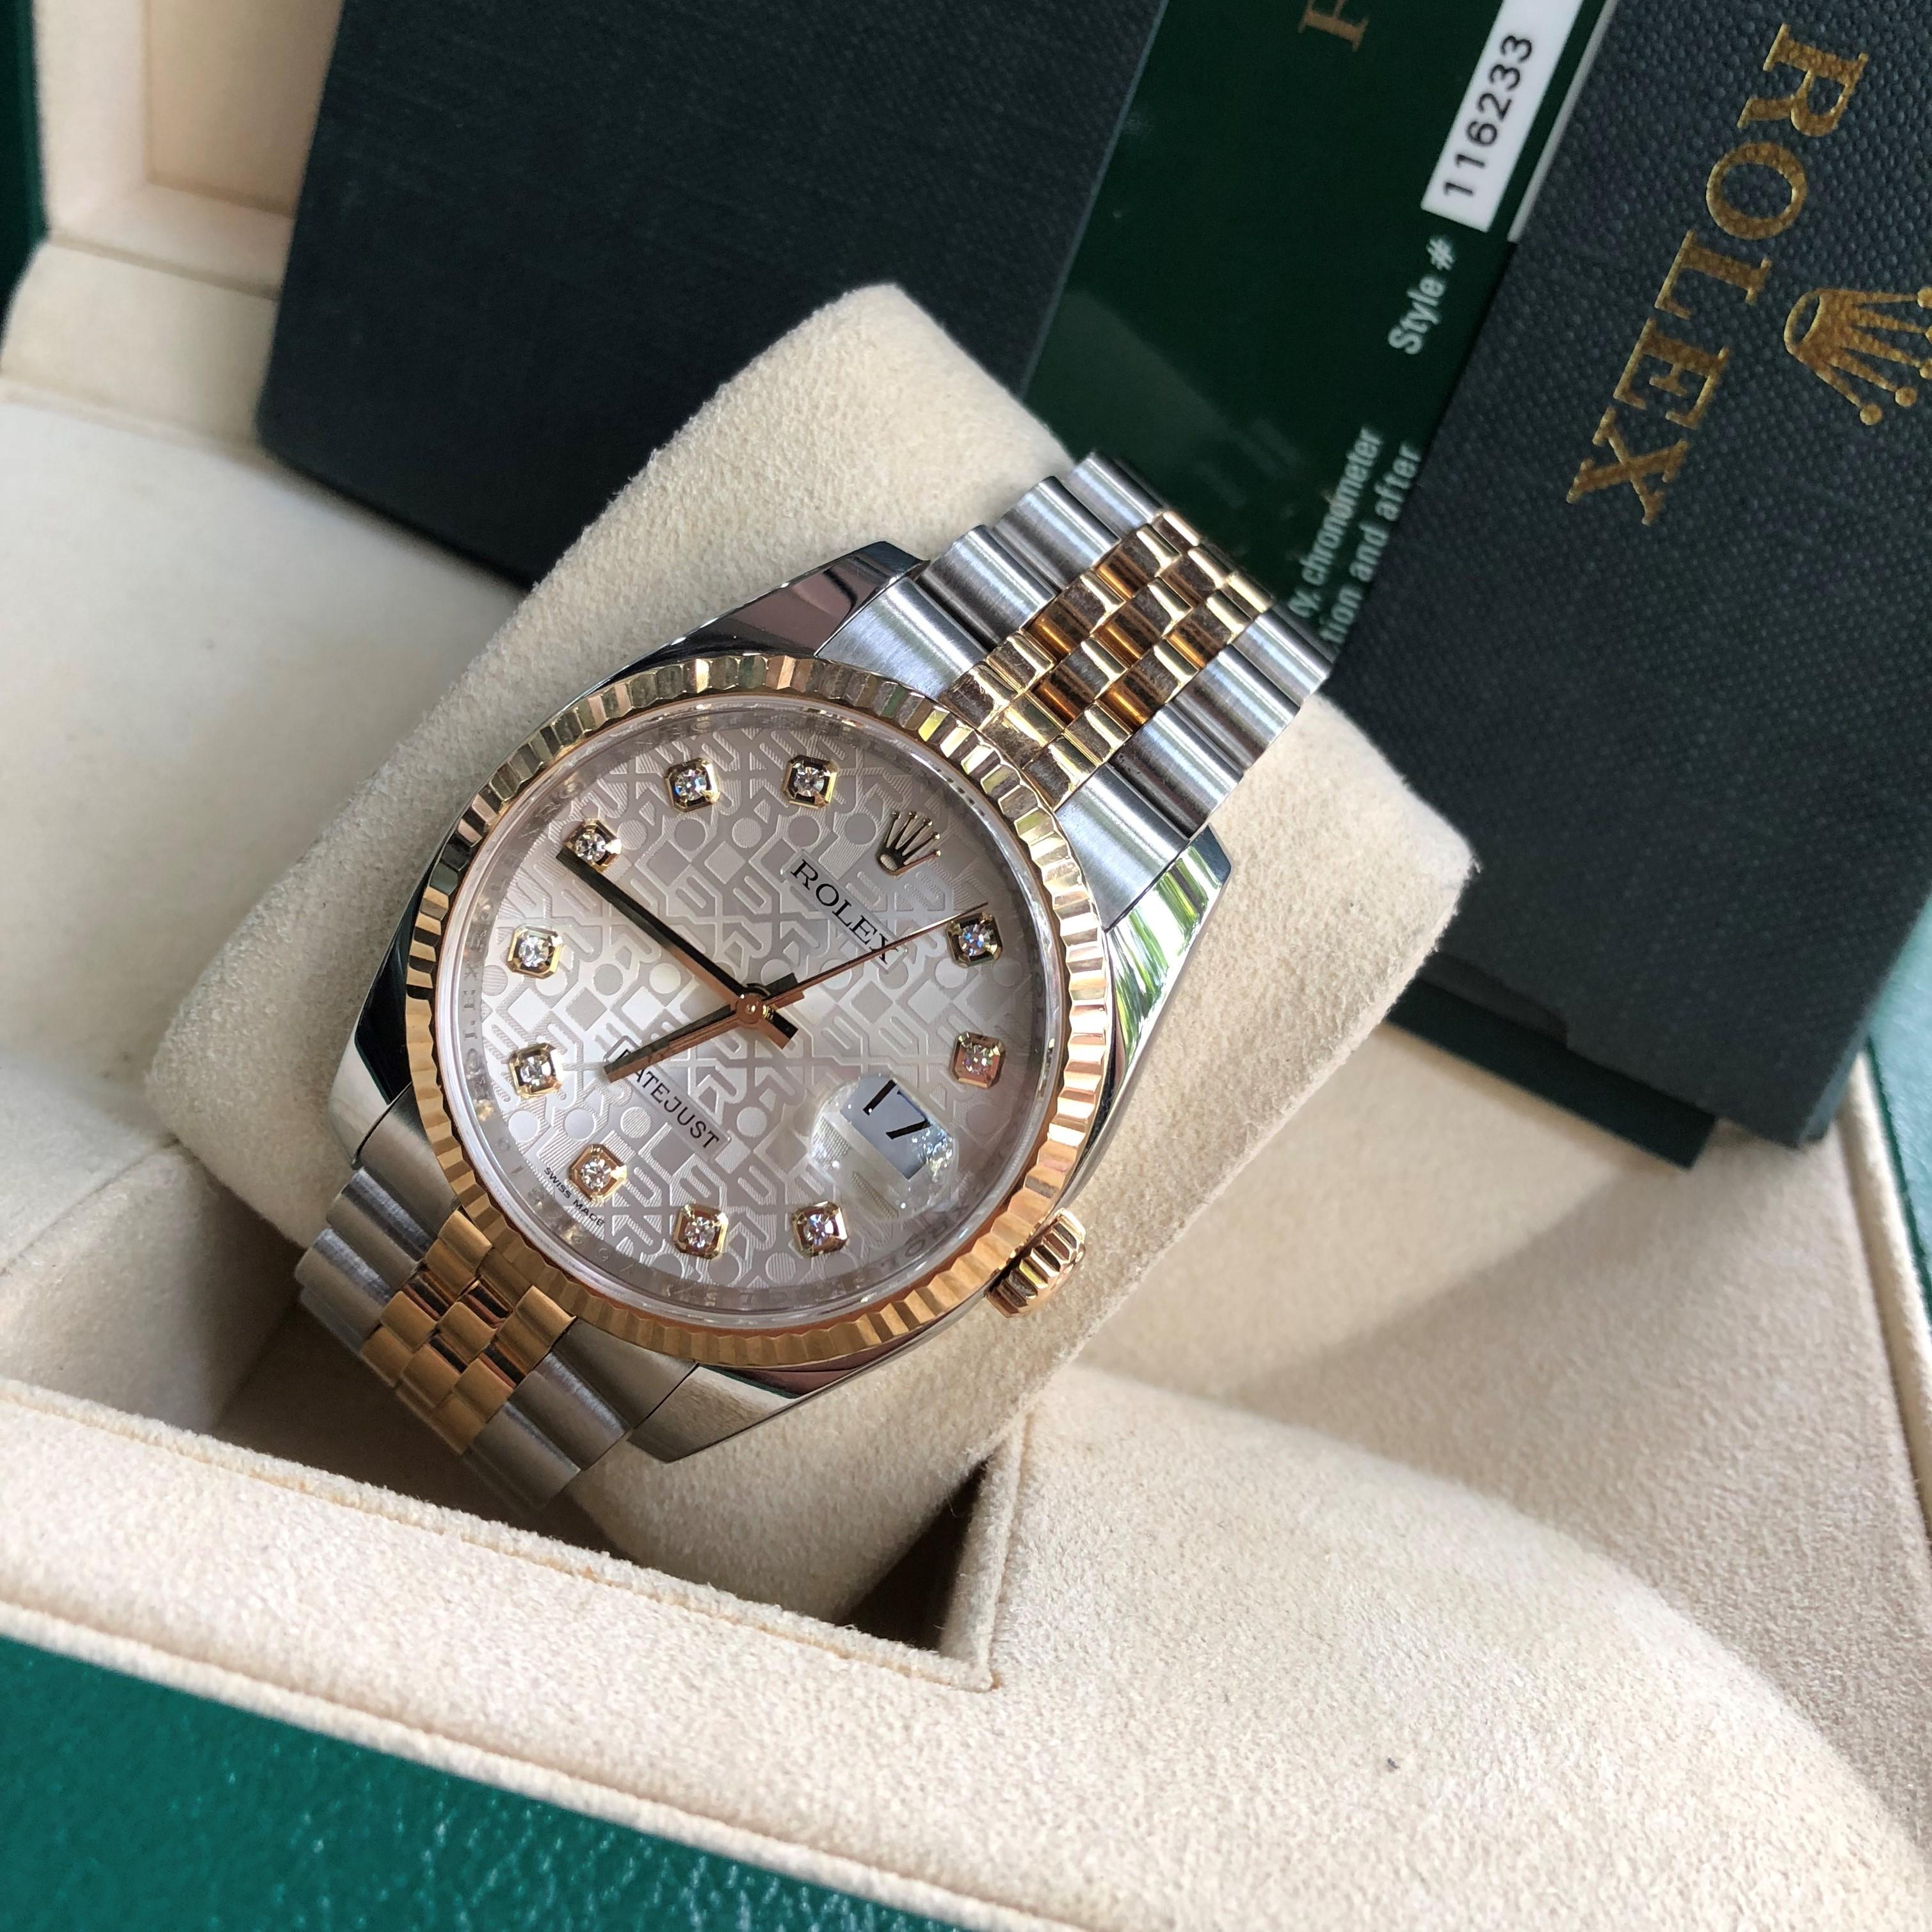 Rolex 116233 mặt vi tính demi vàng 18k Fullbox 2010